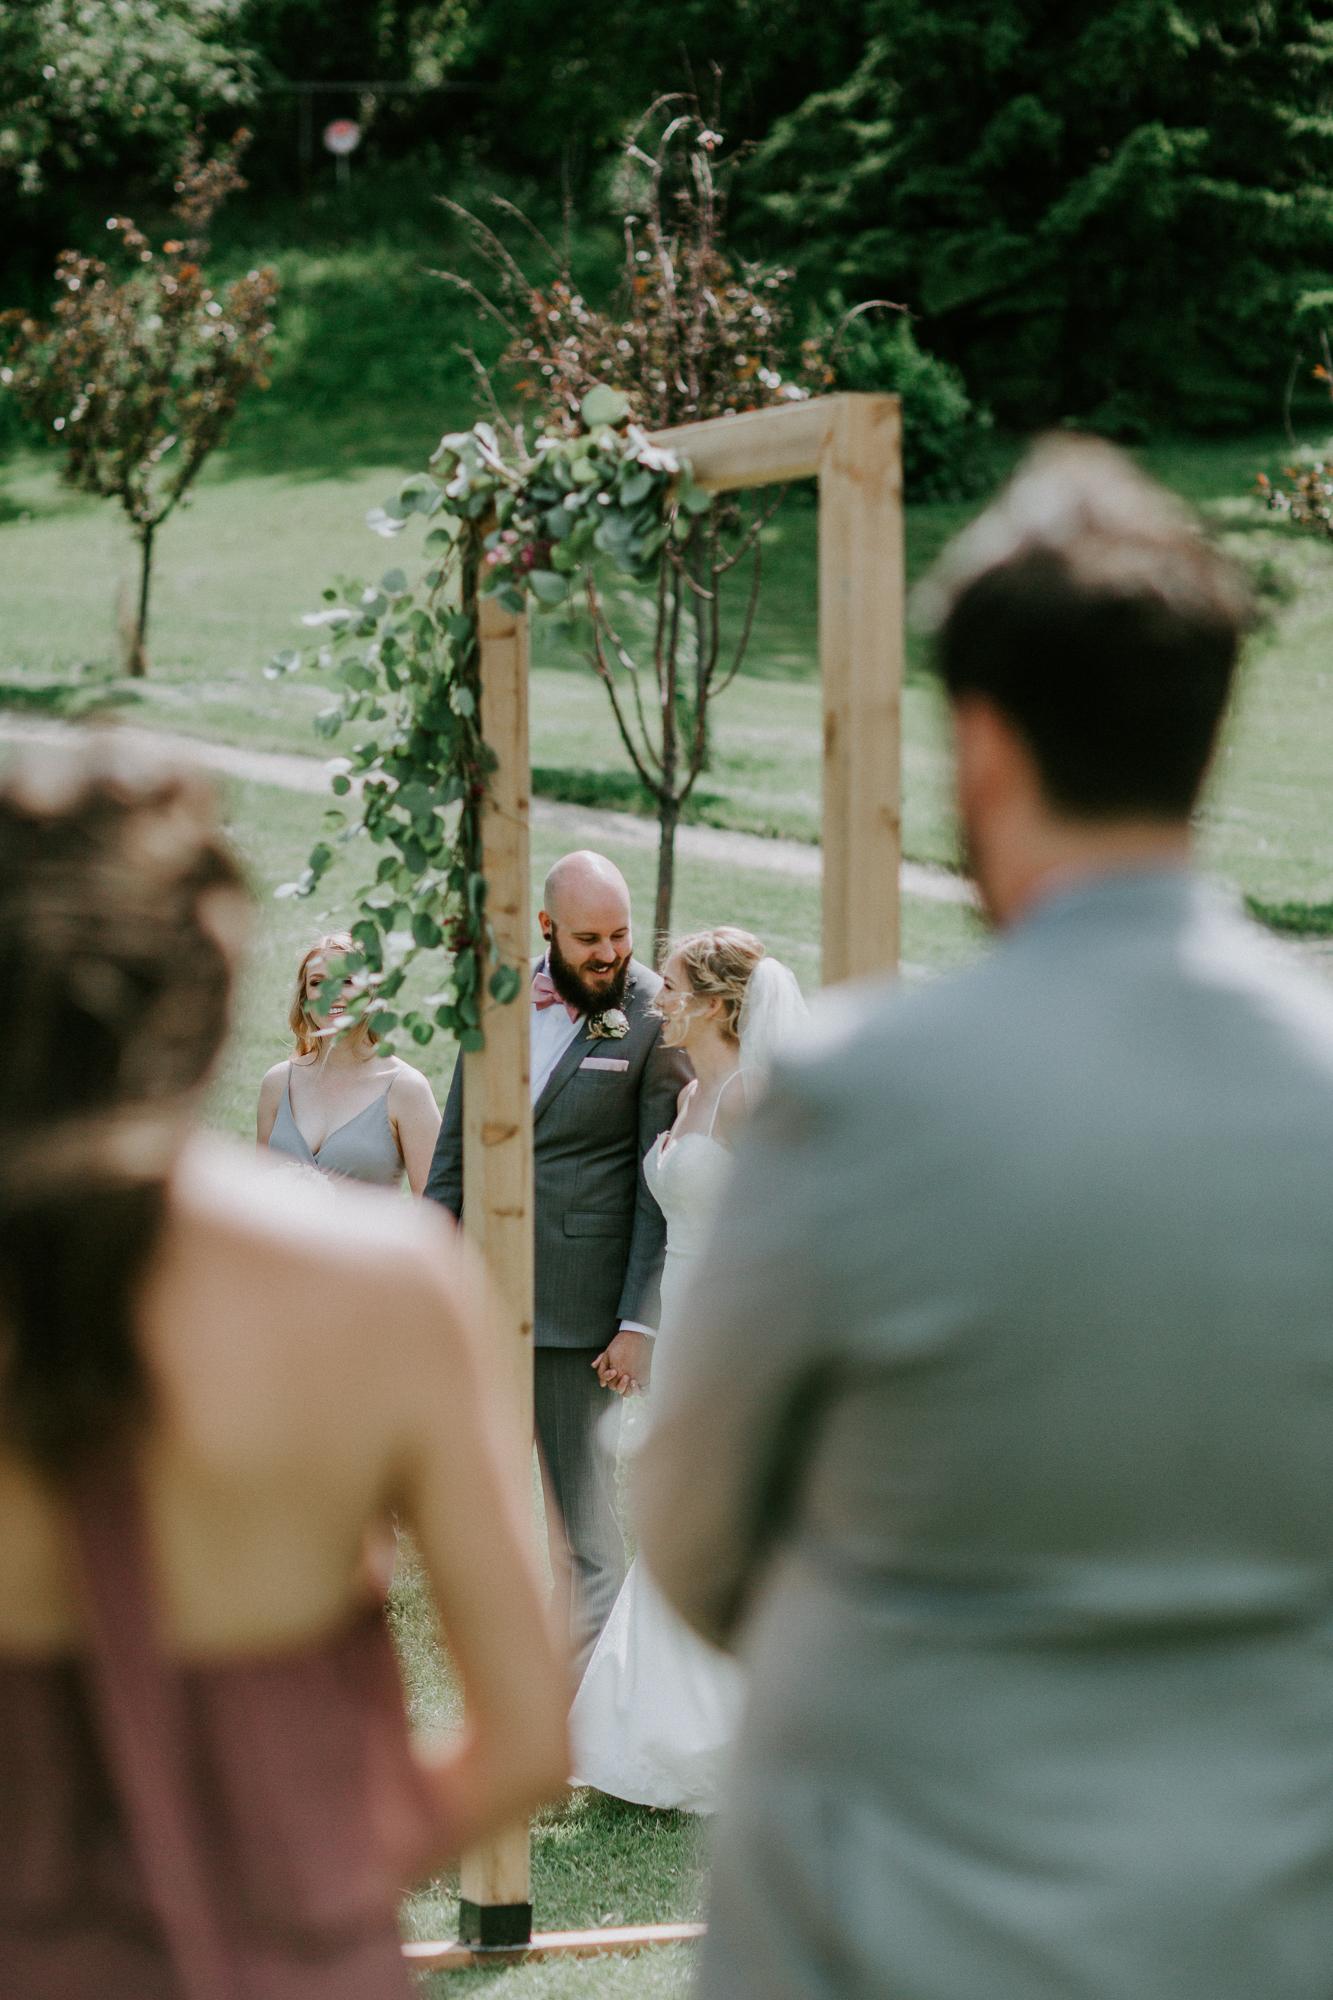 Calgary-wedding-photographer-am-51.jpg